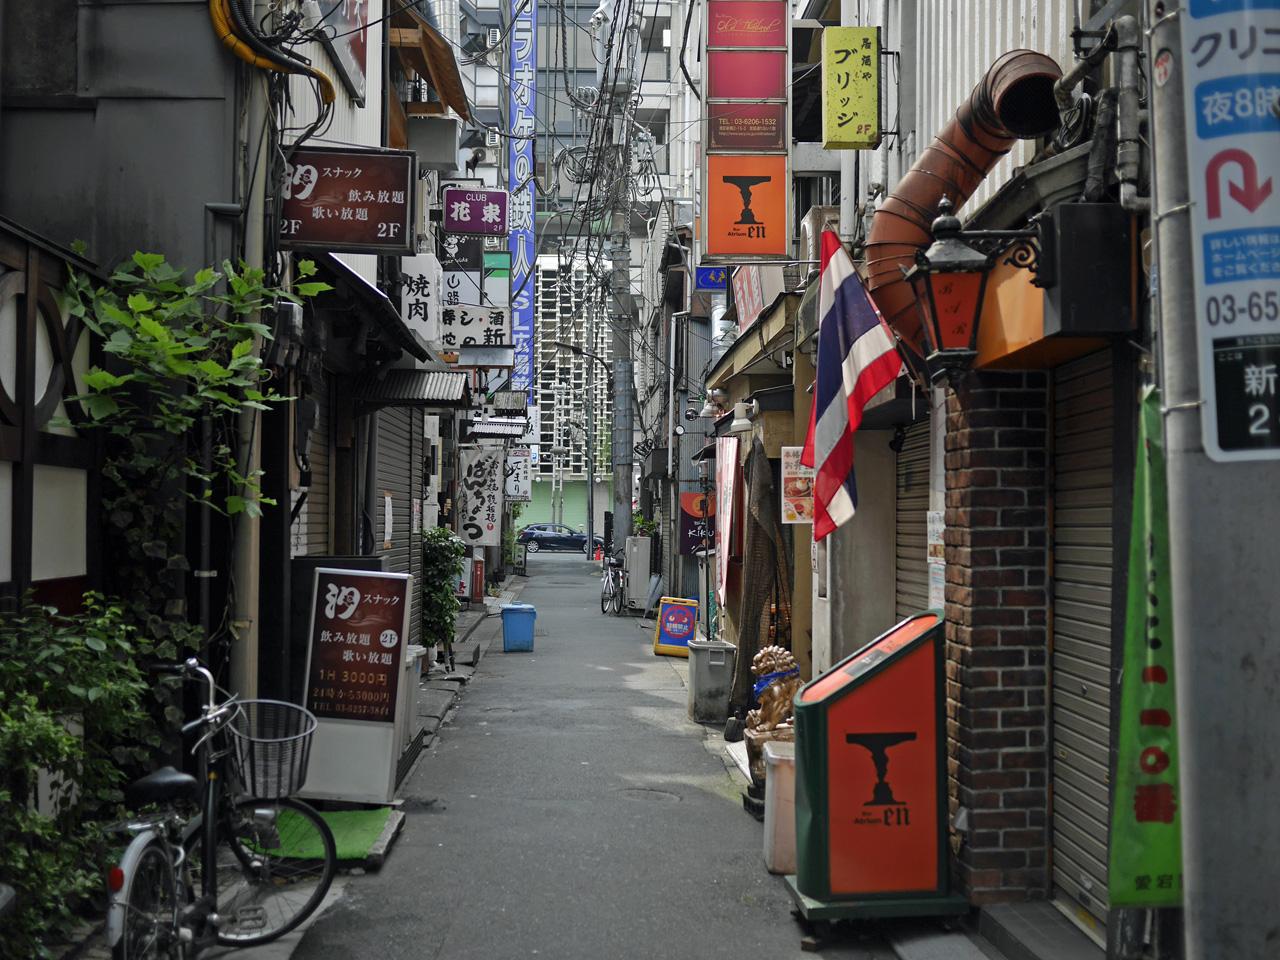 新橋駅日比谷口の飲食店街小路